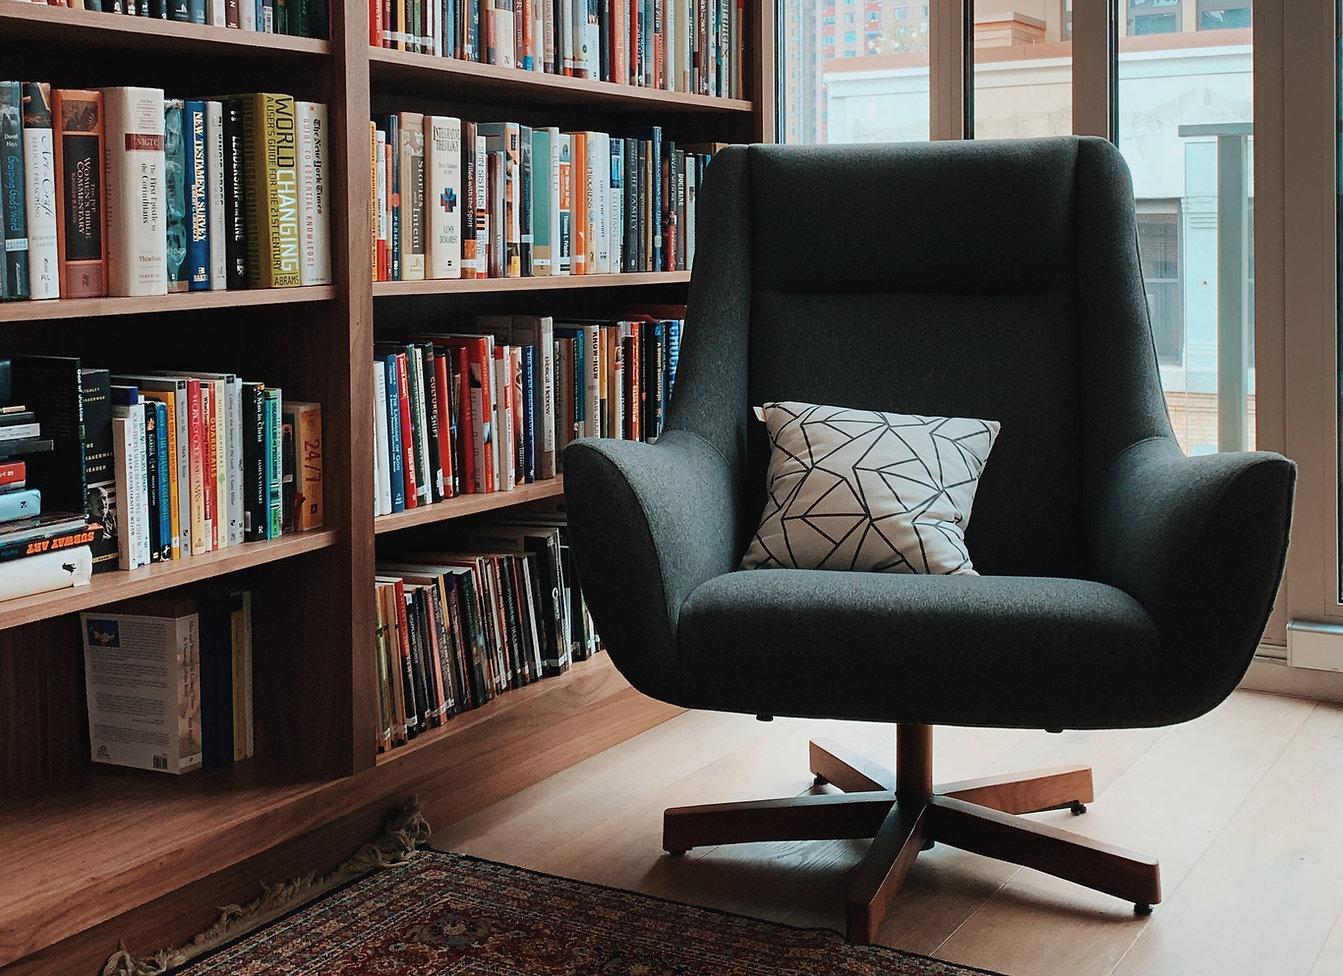 Wohnbibliothek